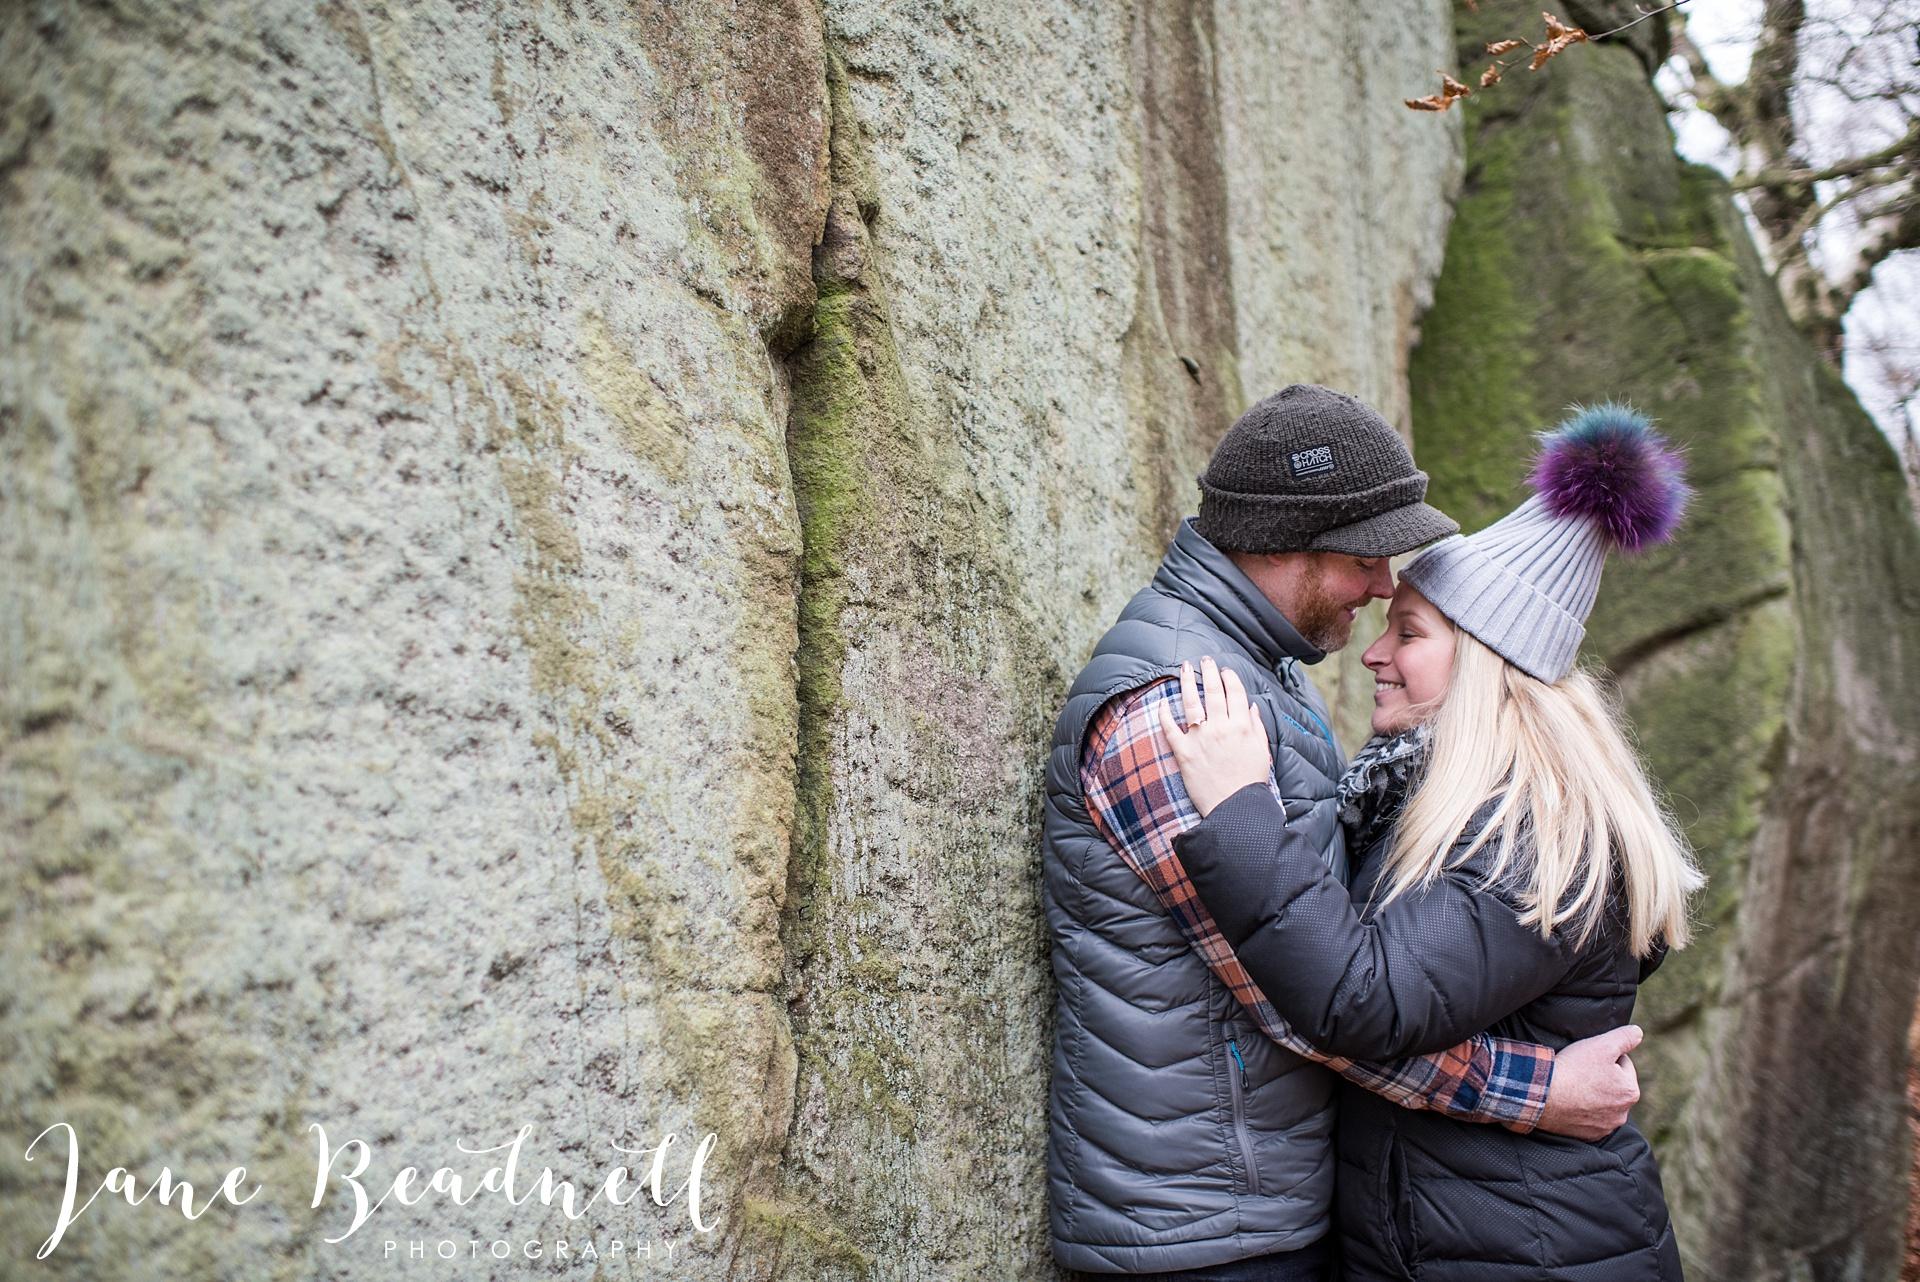 yorkshire-wedding-photographer-jane-beadnell-photography-uk-and-destination-wedding-photographer-engagement-shoot_0052